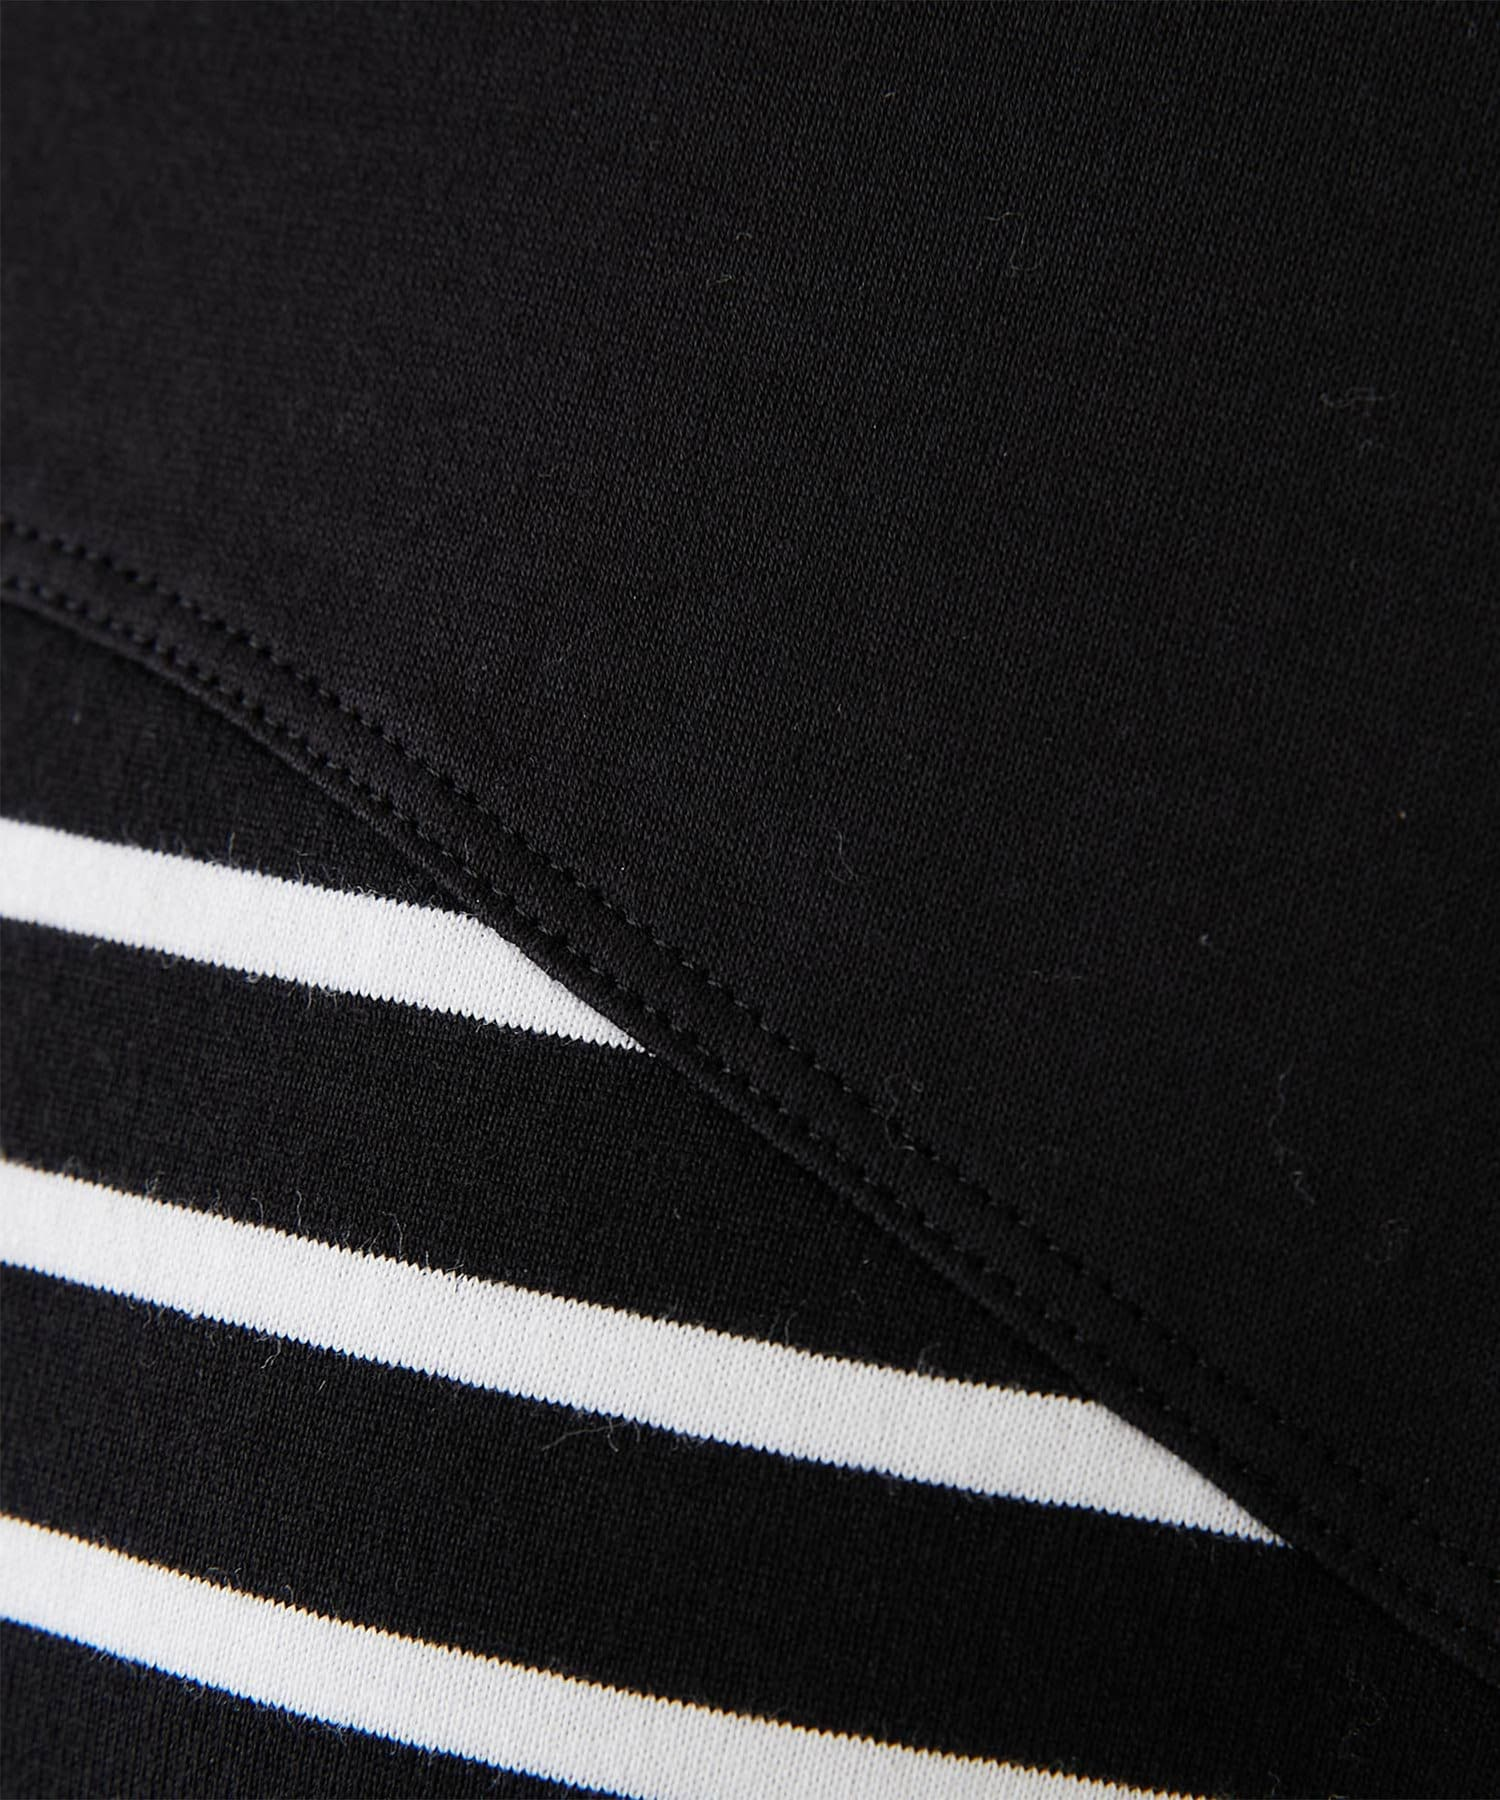 GALLARDAGALANTE(ガリャルダガランテ) 【CEPIE.】スリットスリーブボーダーロングTシャツ